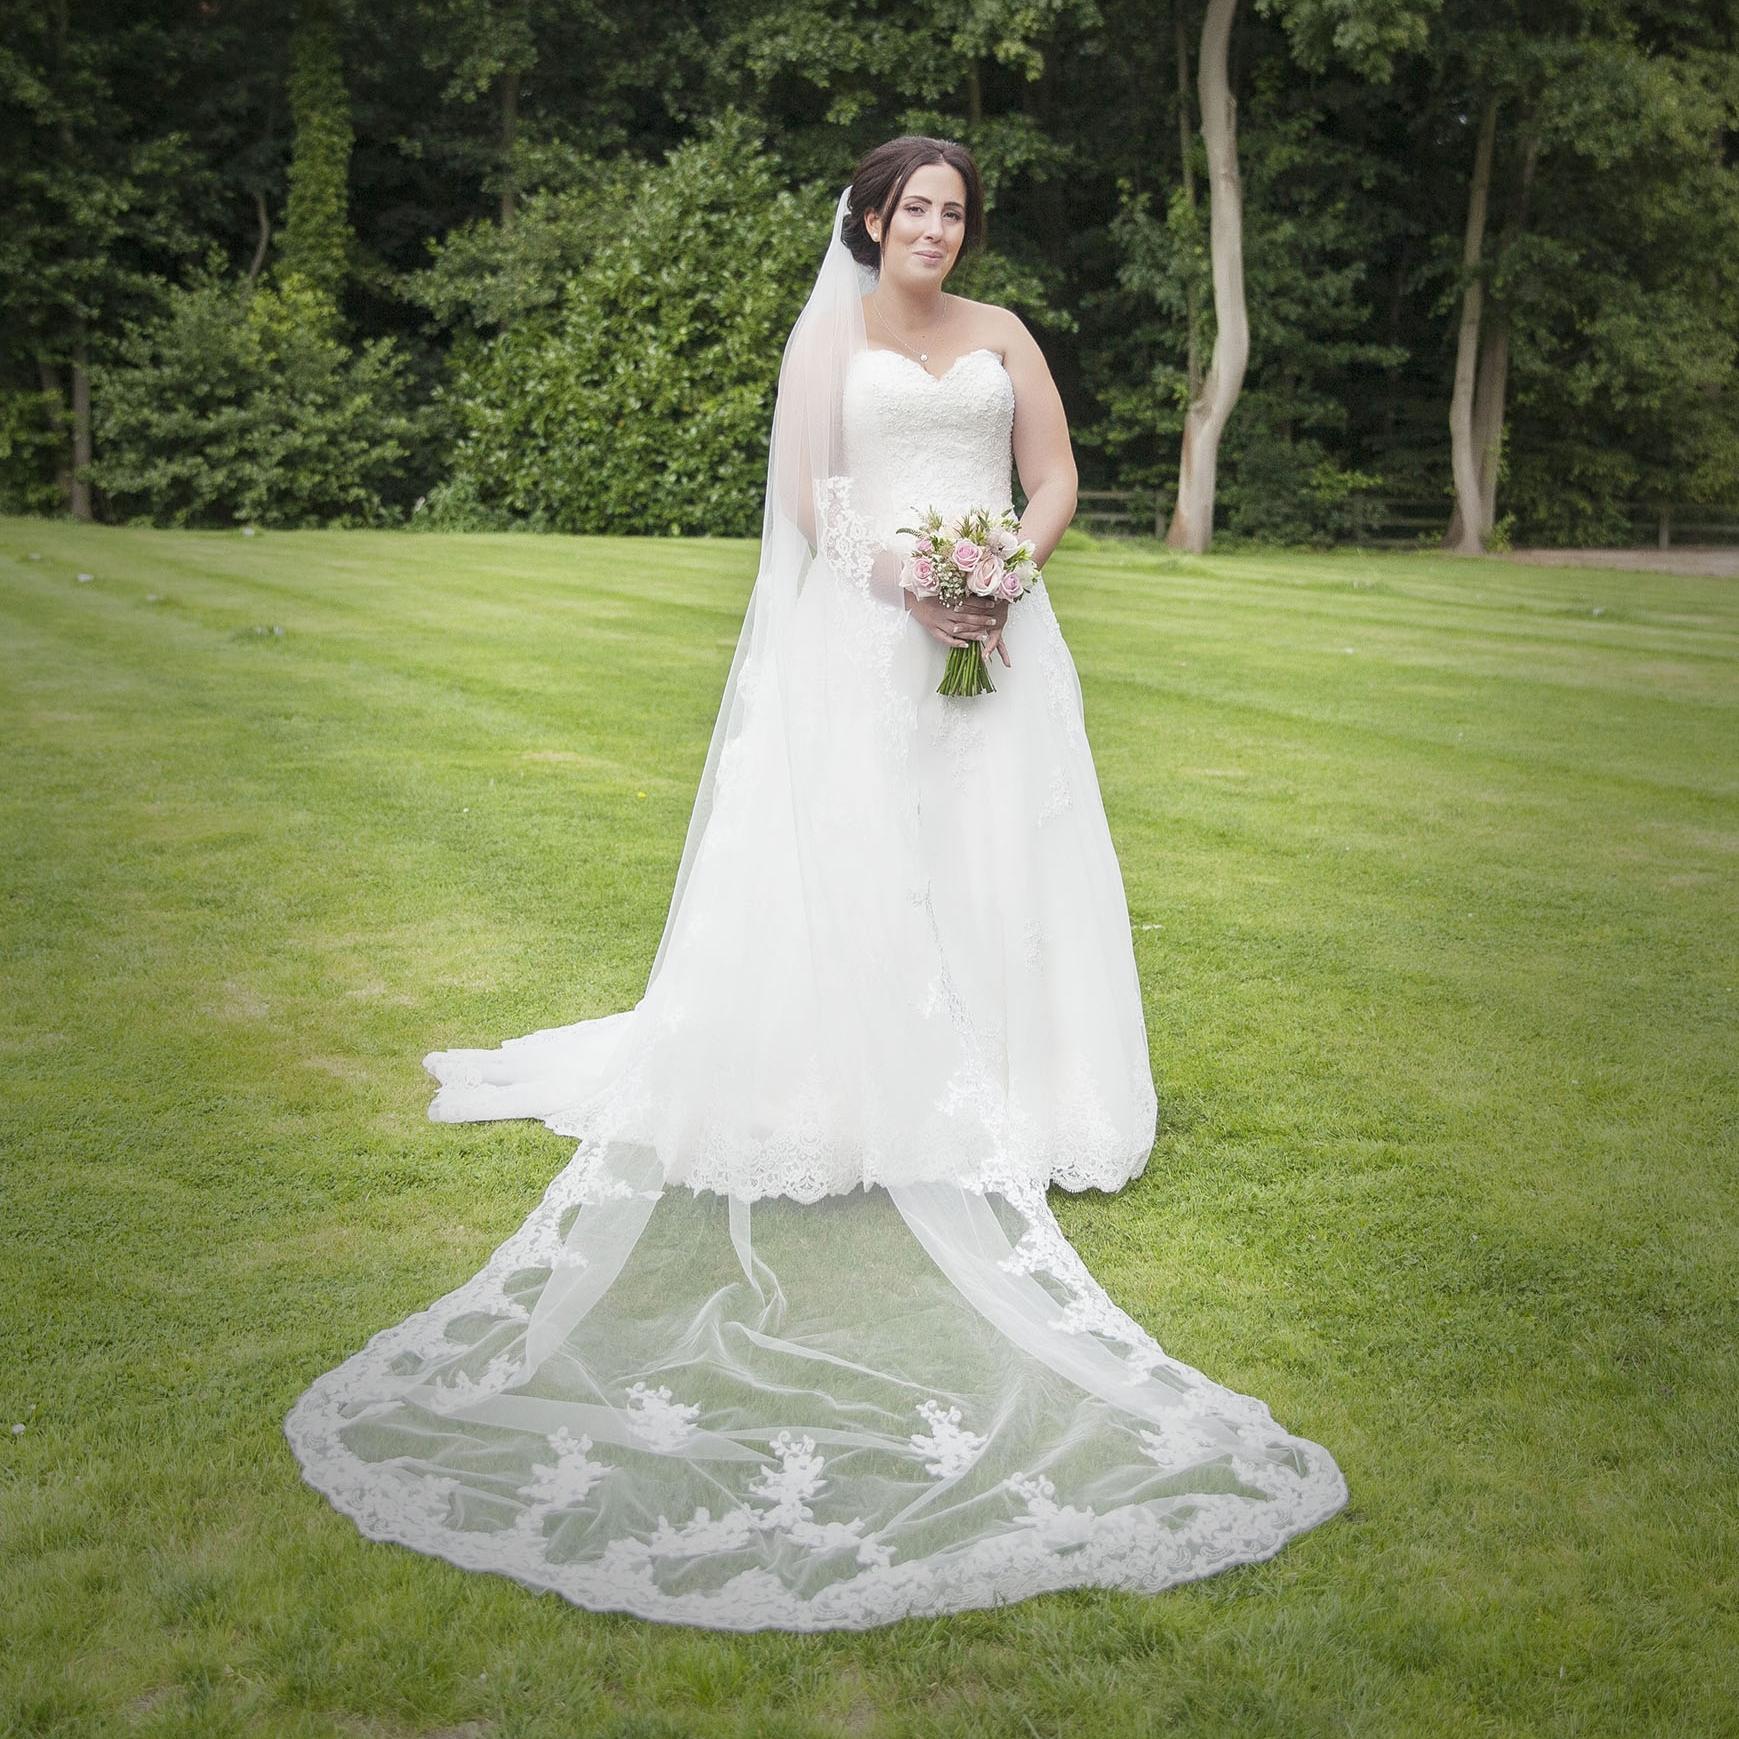 elizabethgphotography_kingslangley_hertfordshire_fineart_wedding_tewinbury_farm_tayna_15.jpg